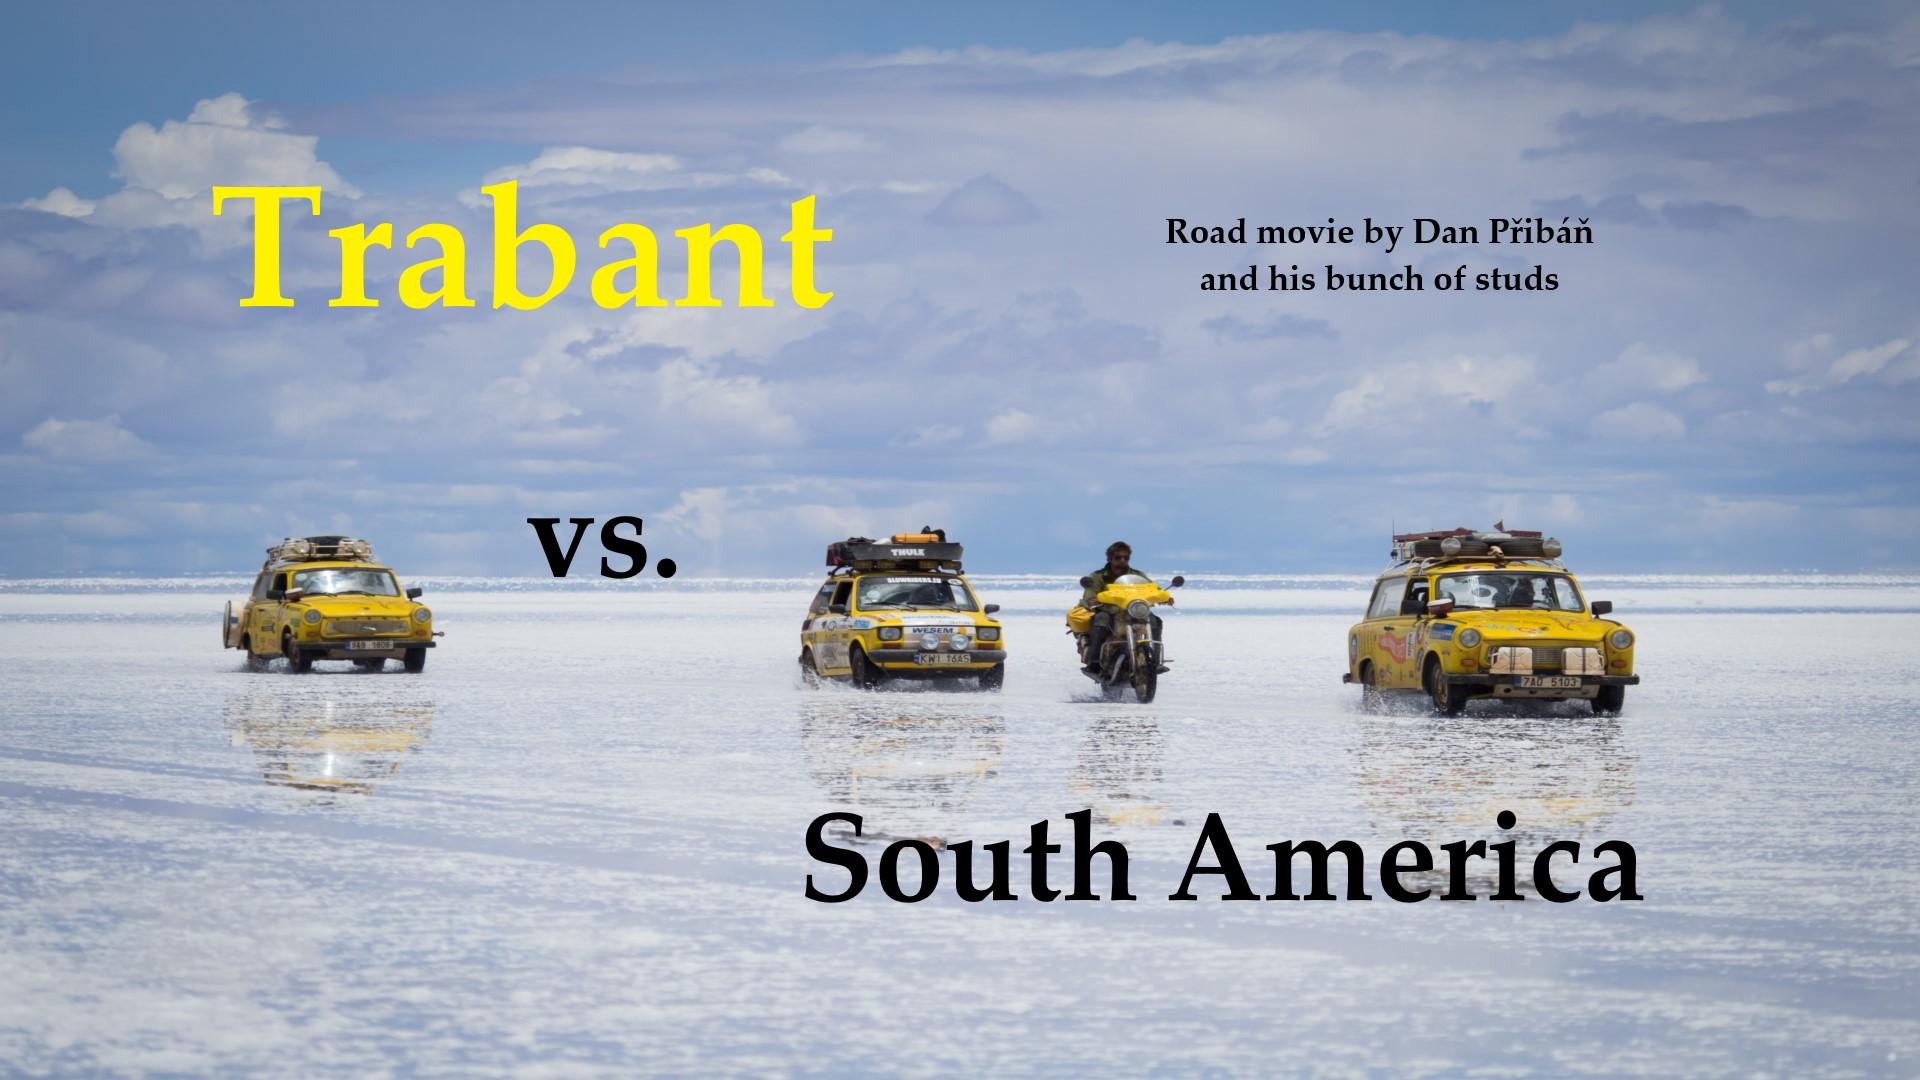 Trabant vs. South America